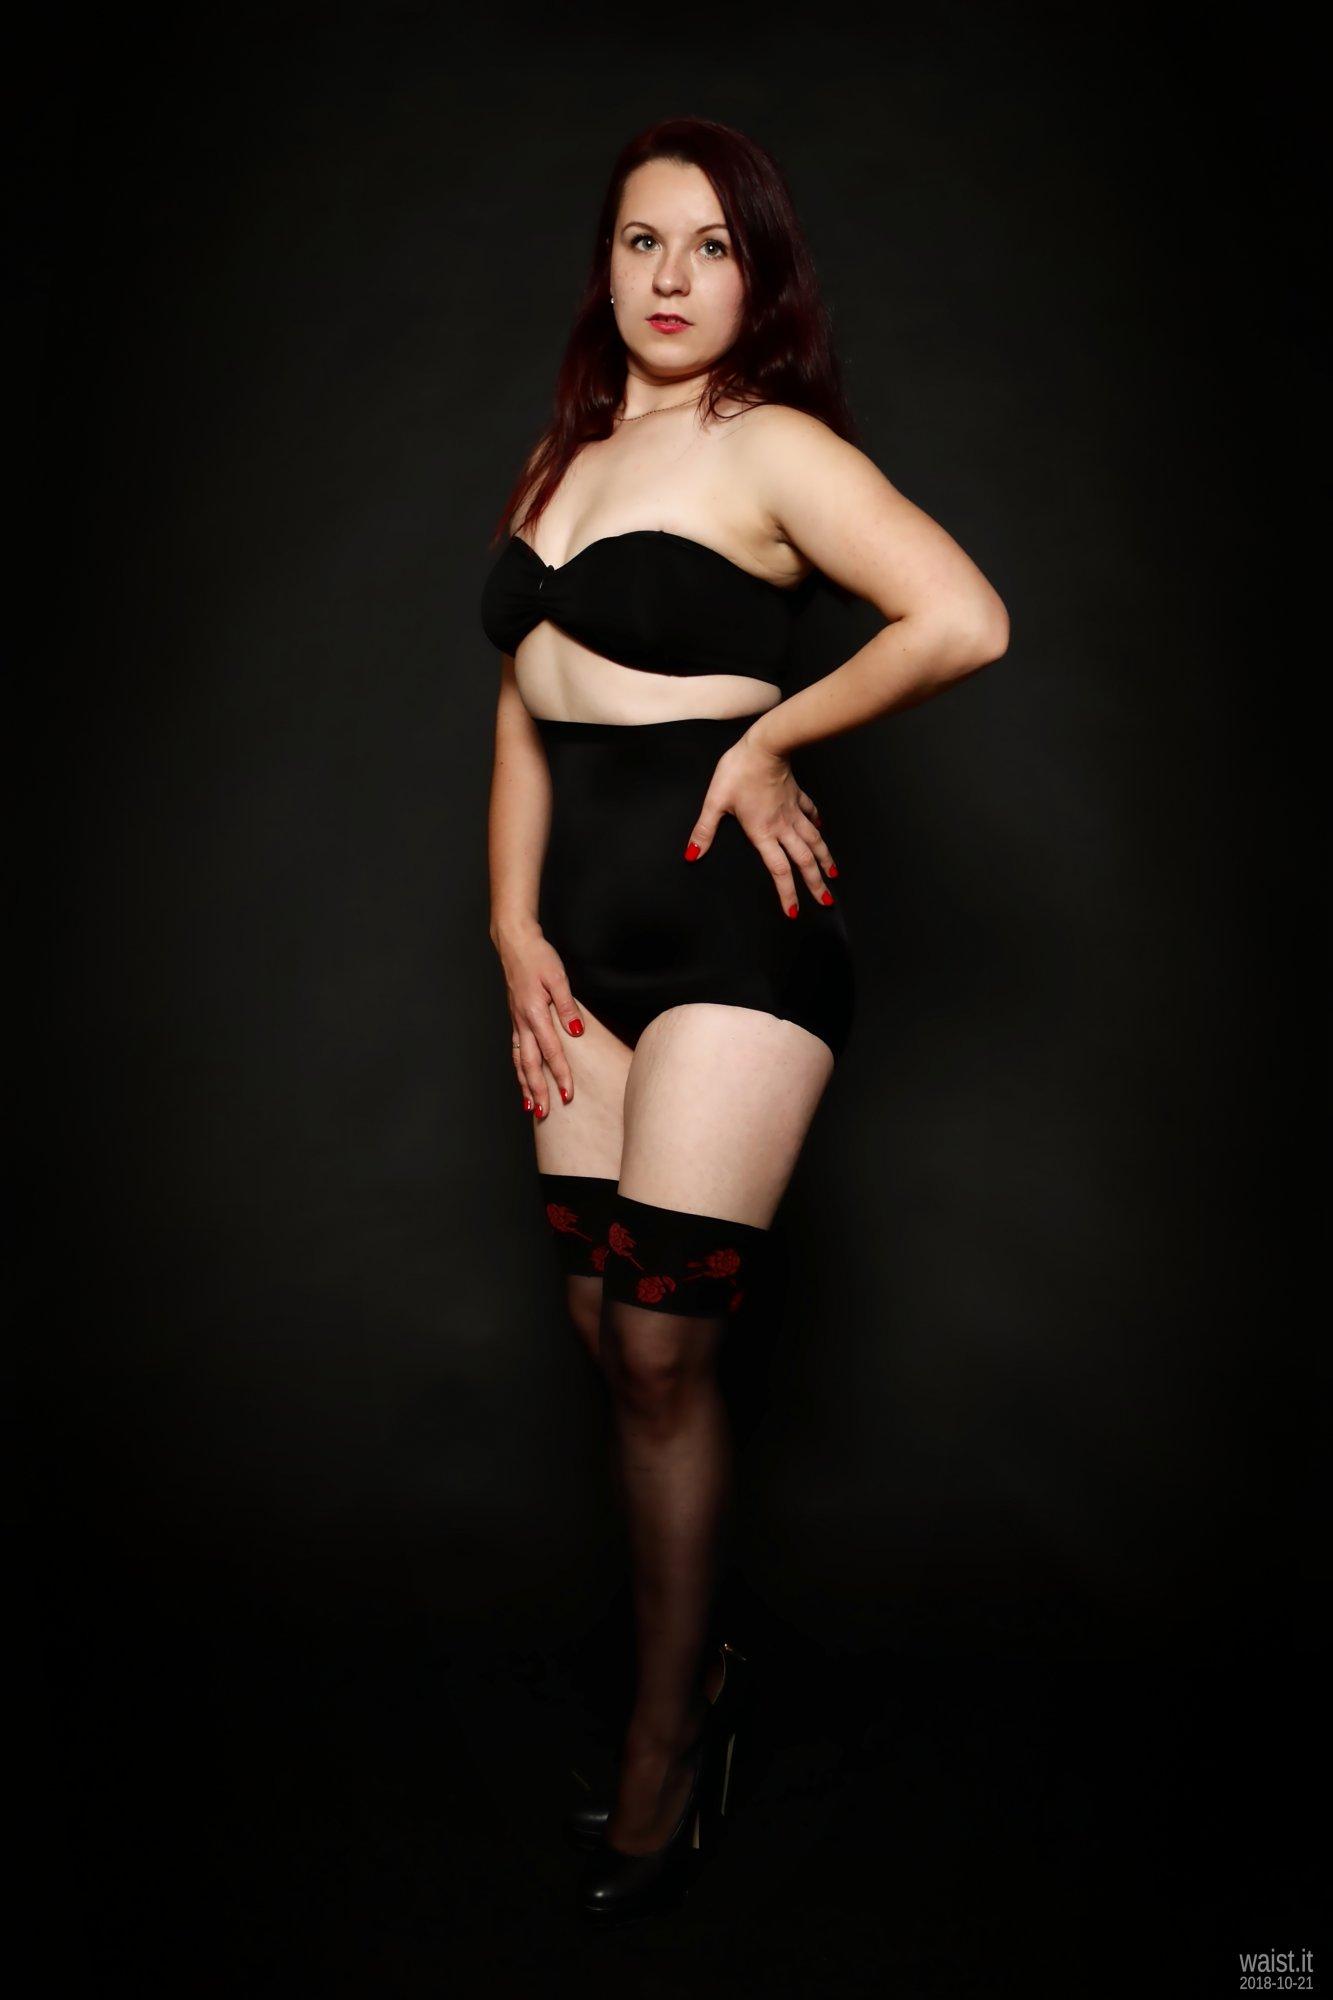 2018-10-21 Darya (DaryaM) in black boob-tube and high-waisted, black, Chinese control briefs worn as hotpants